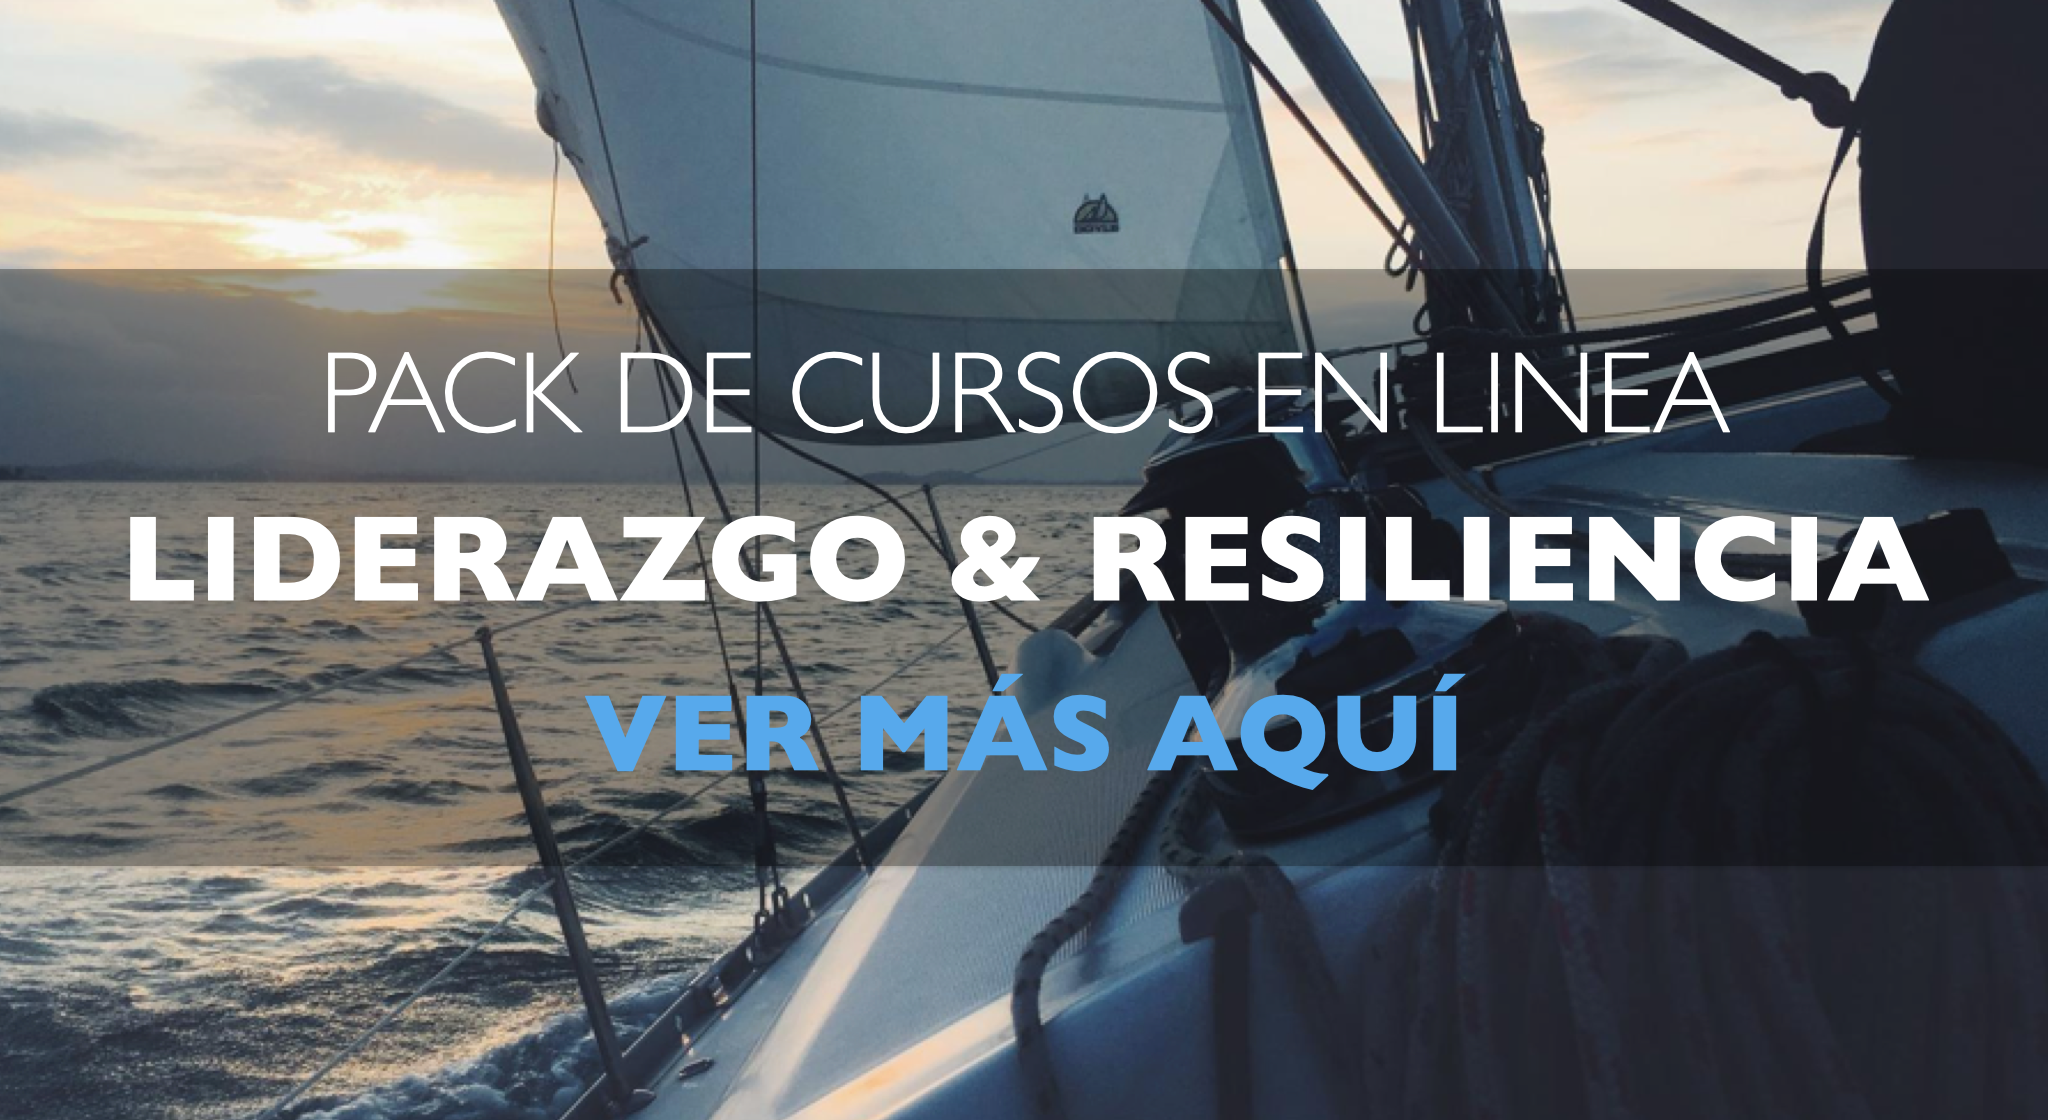 Liderazgo & Resiliencia